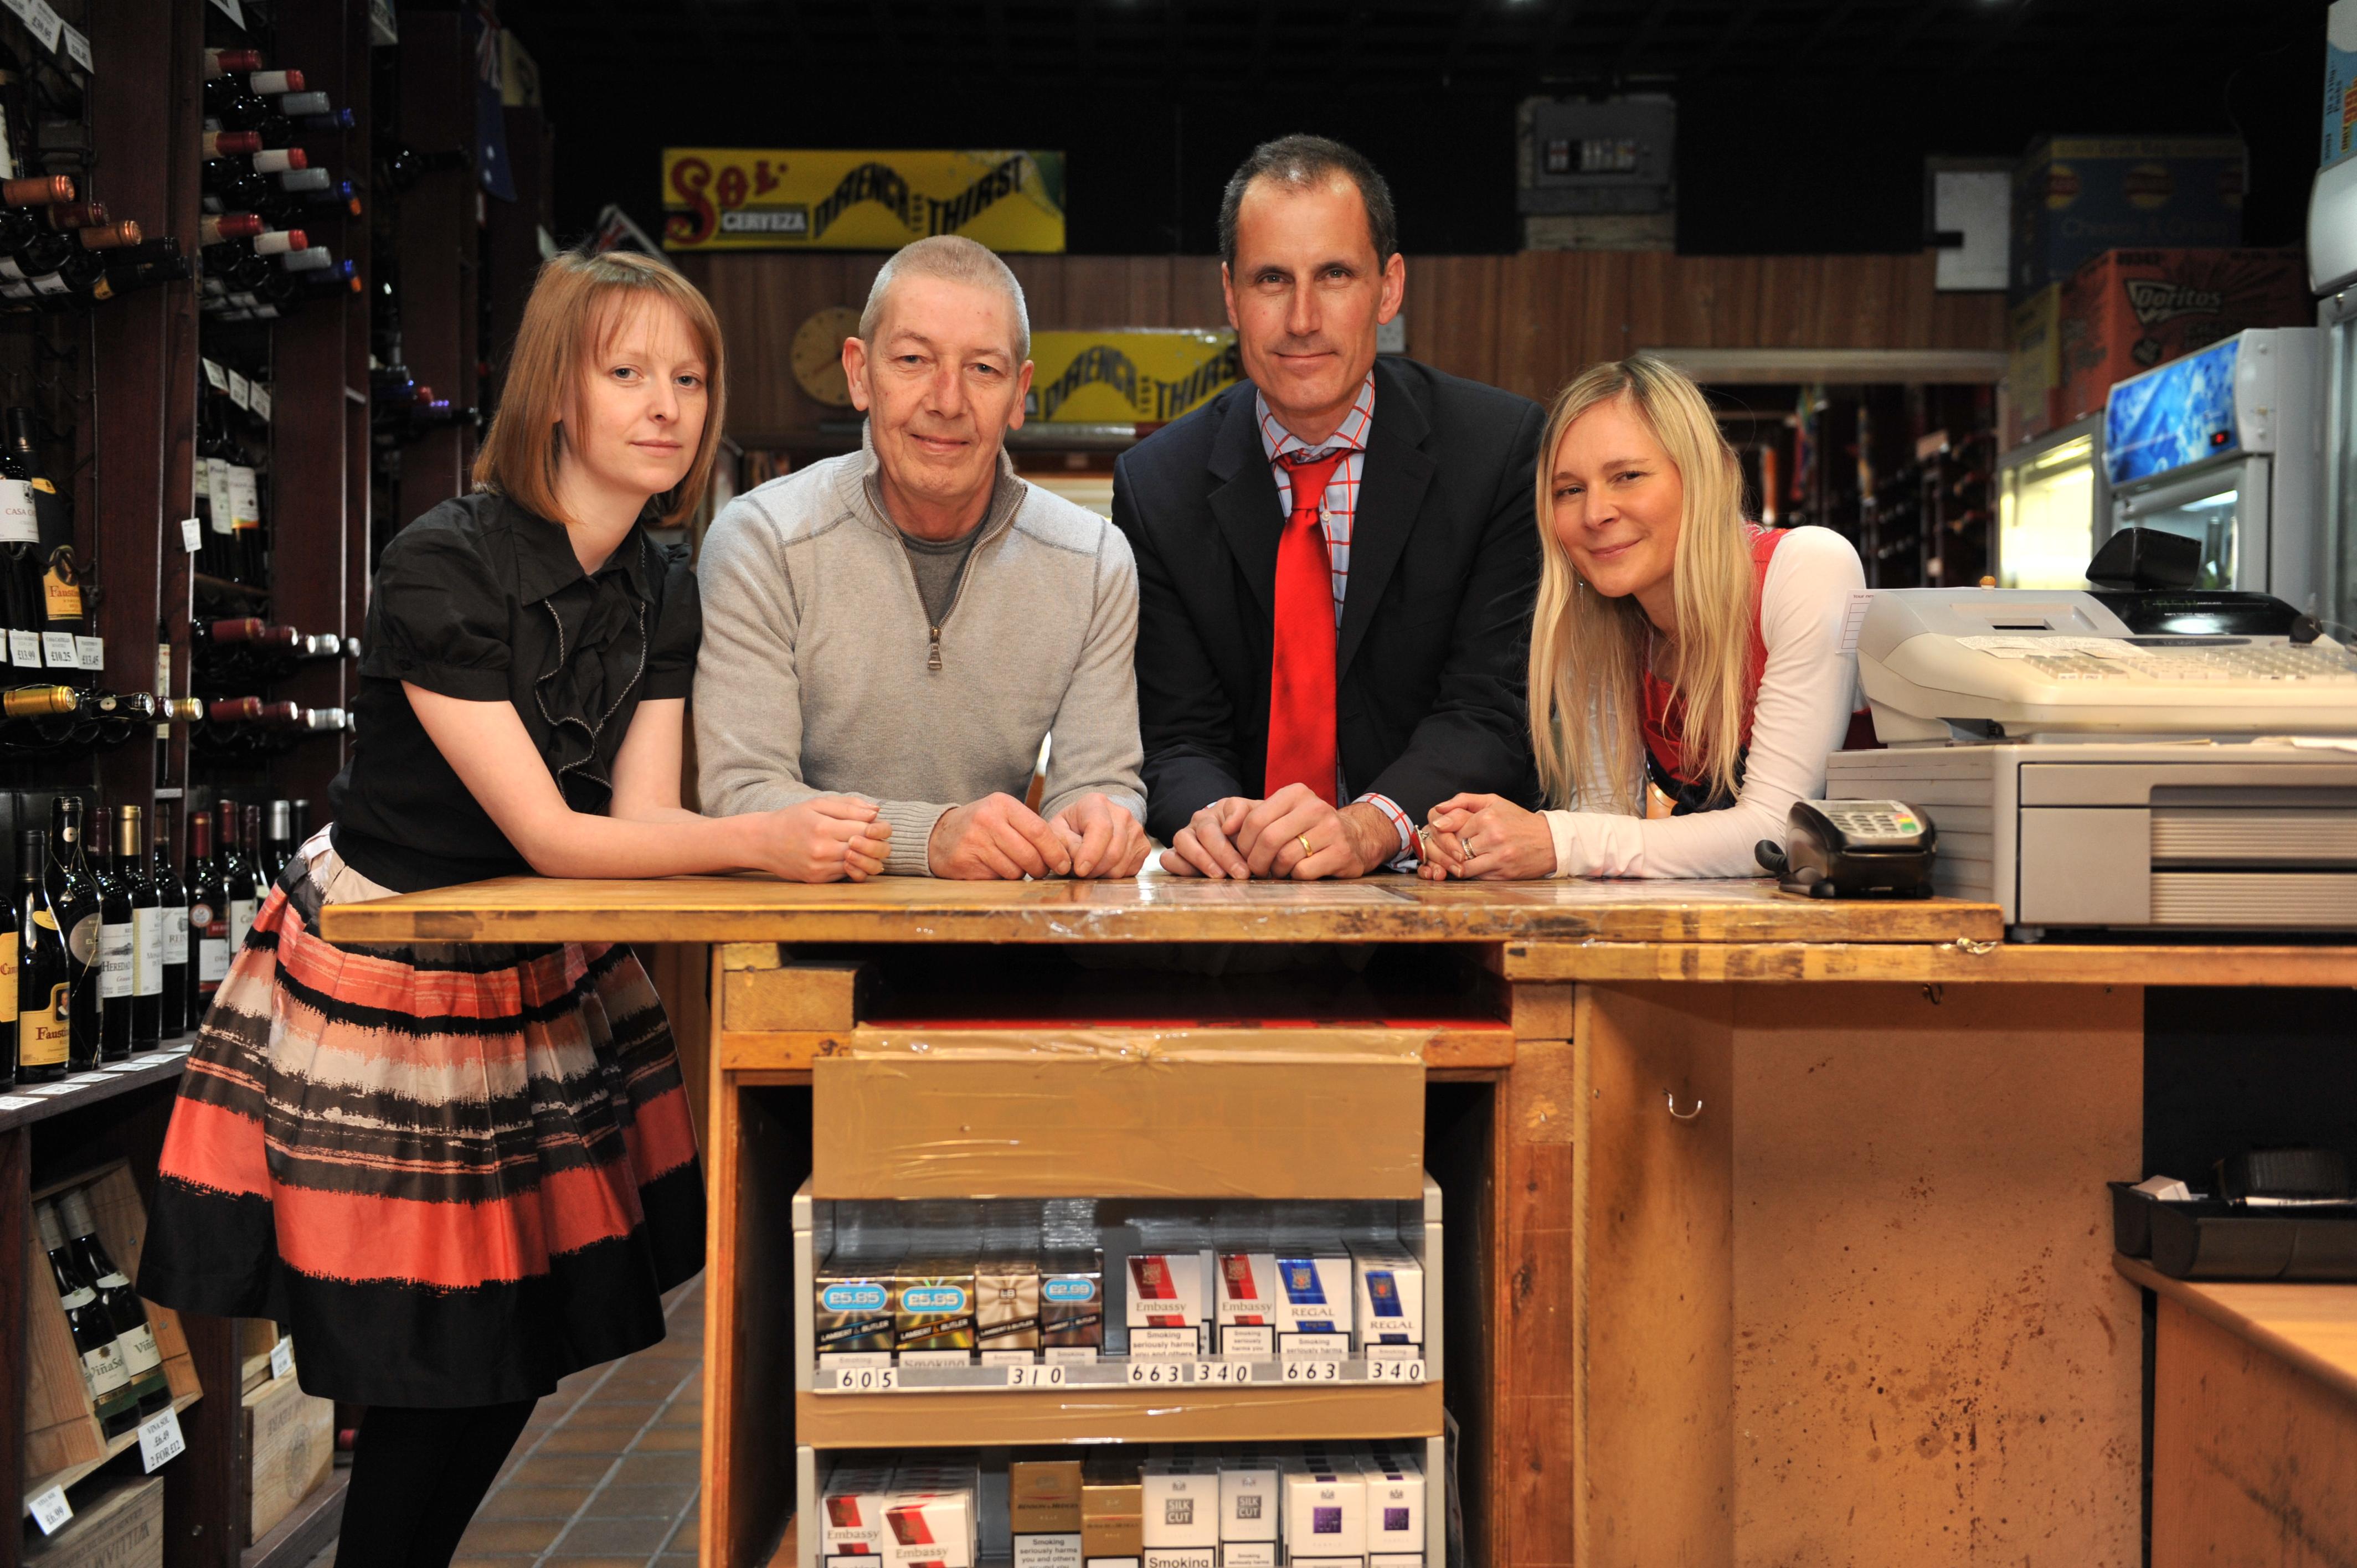 Sefton Central Labour MP Bill Esterson and T.C. Wine Shop manager Len Hartley.